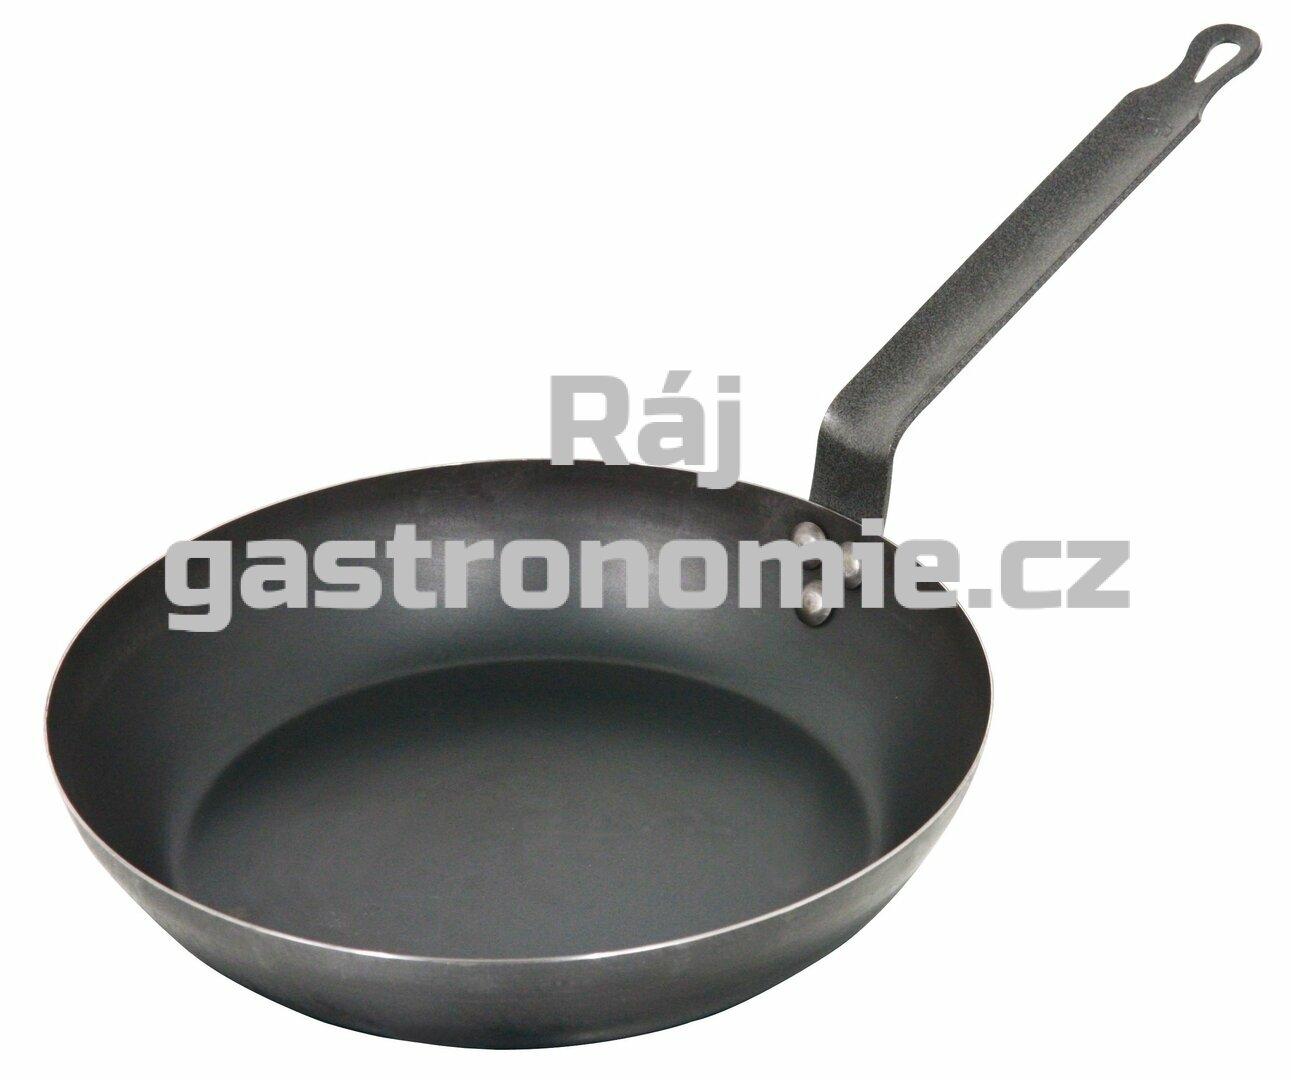 Pánev černá ocel Ø 28 cm